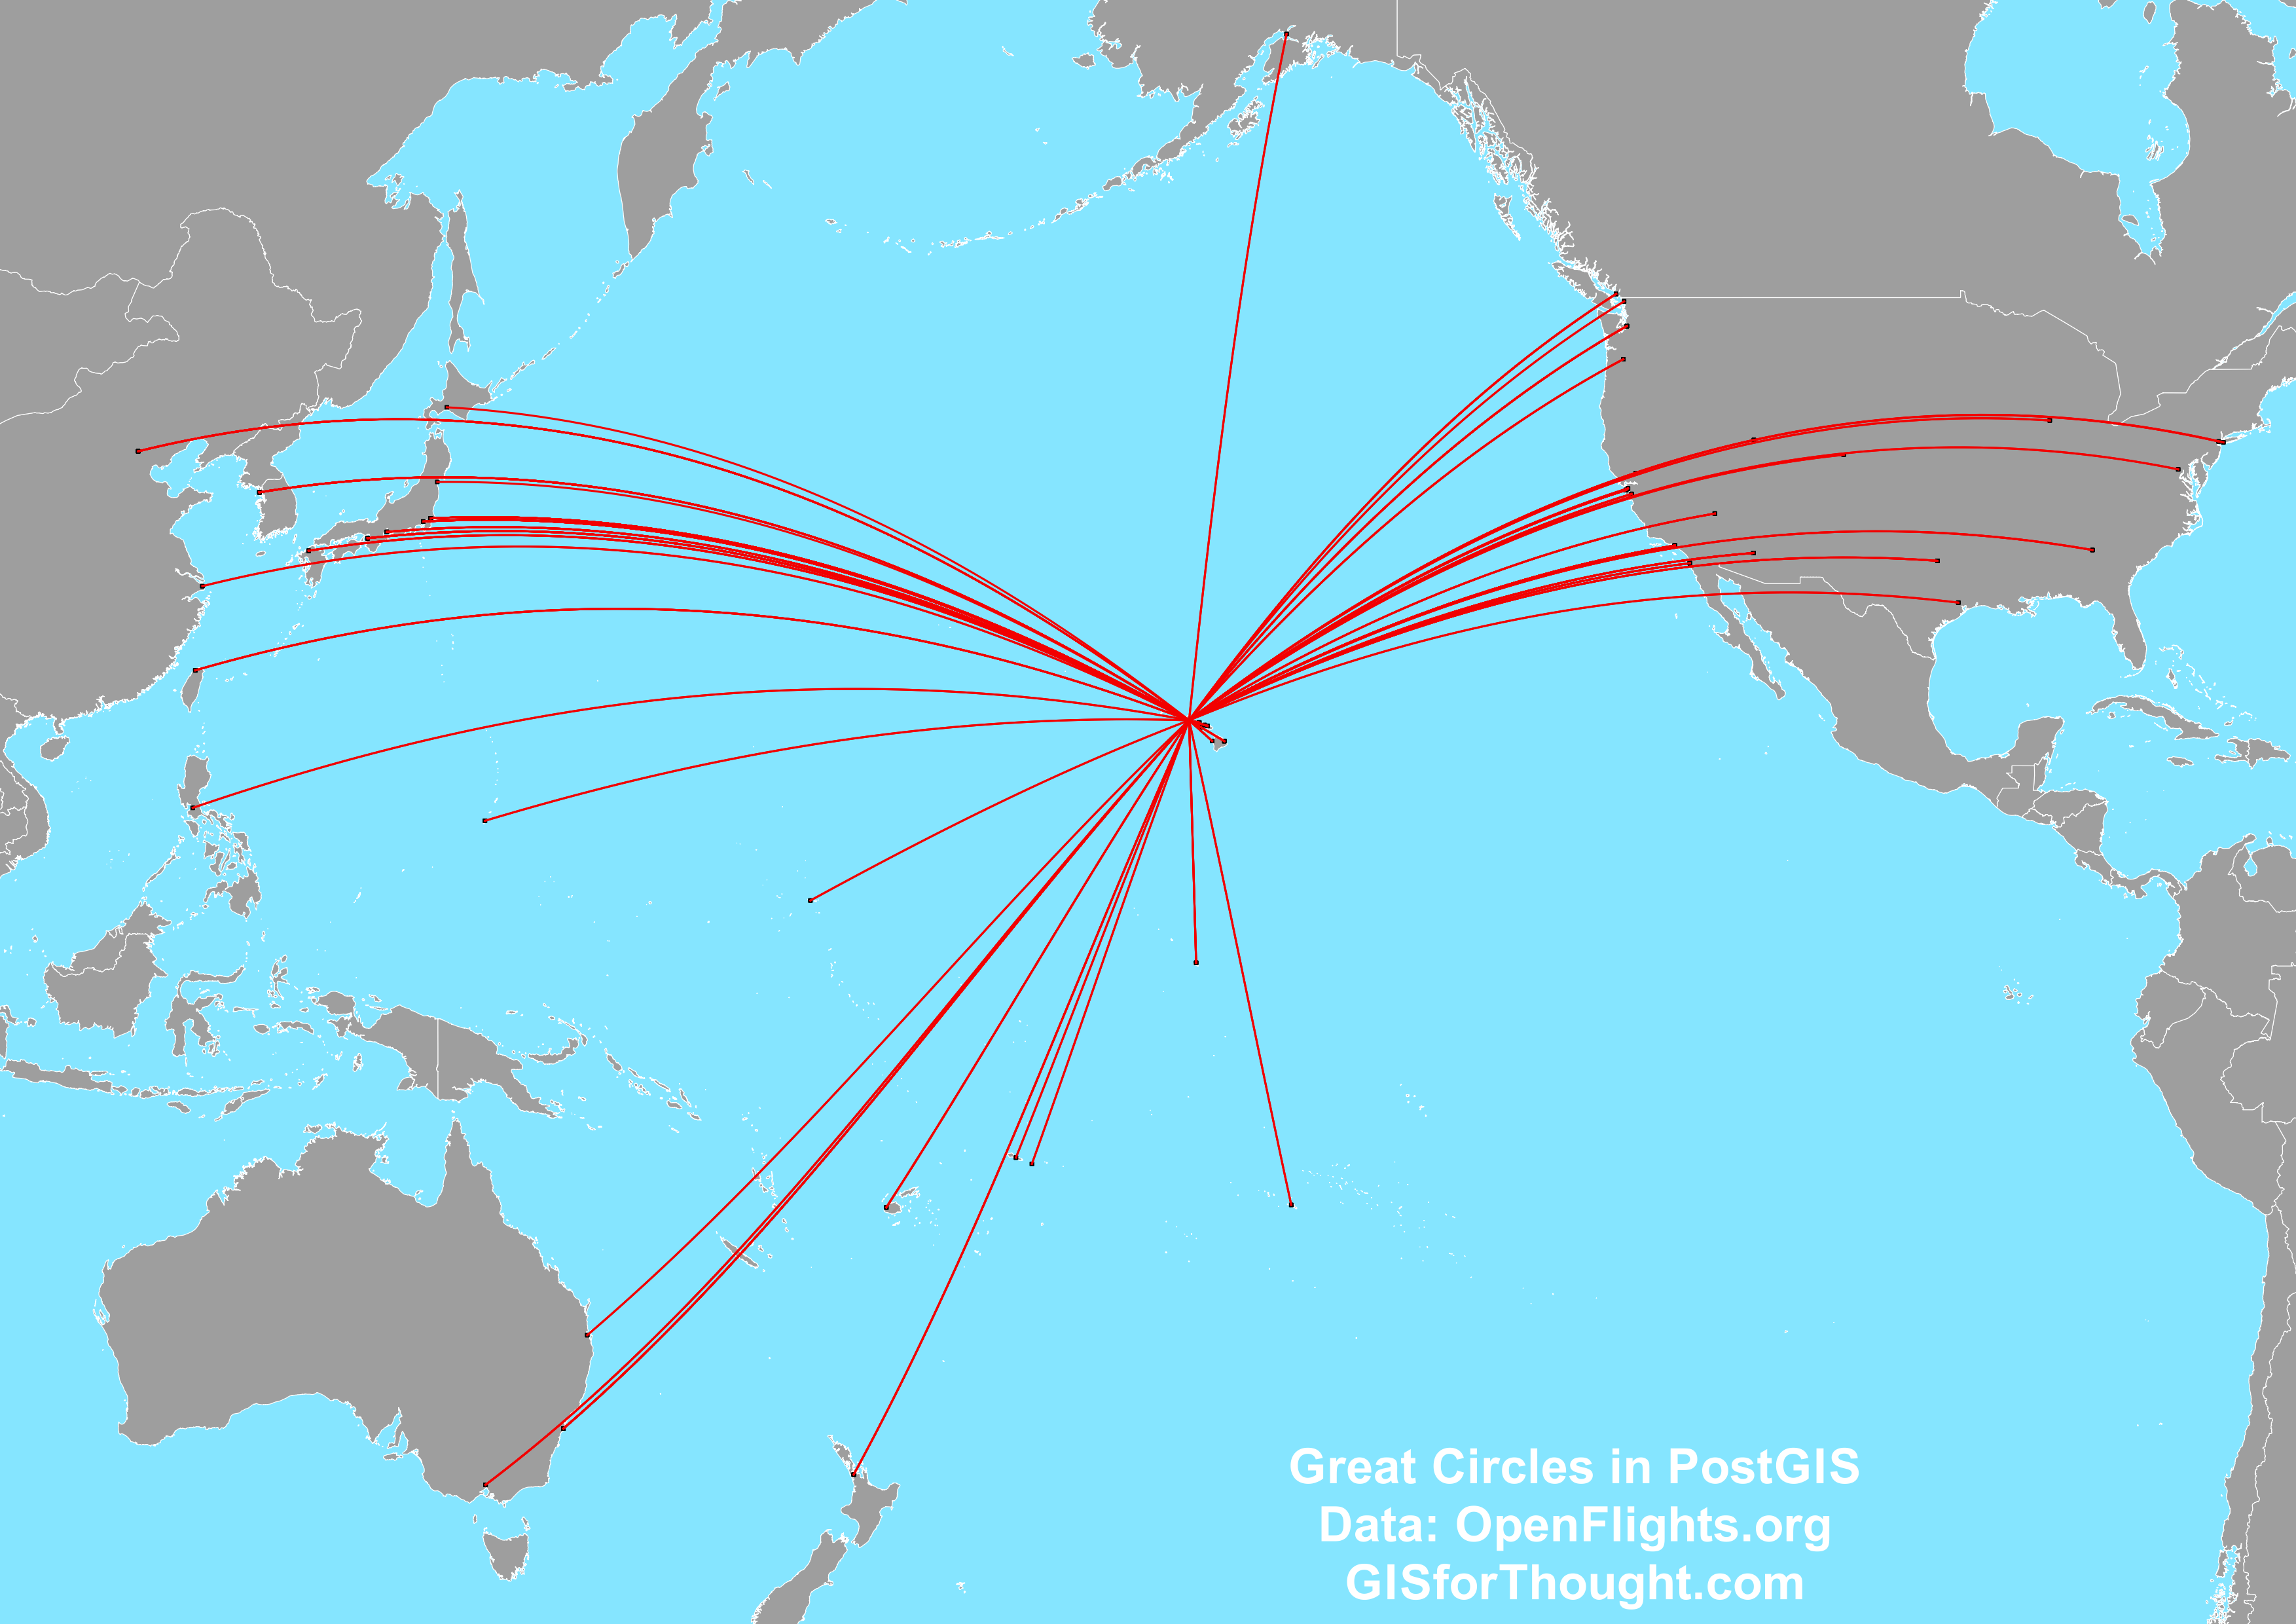 PostGIS Great Circles